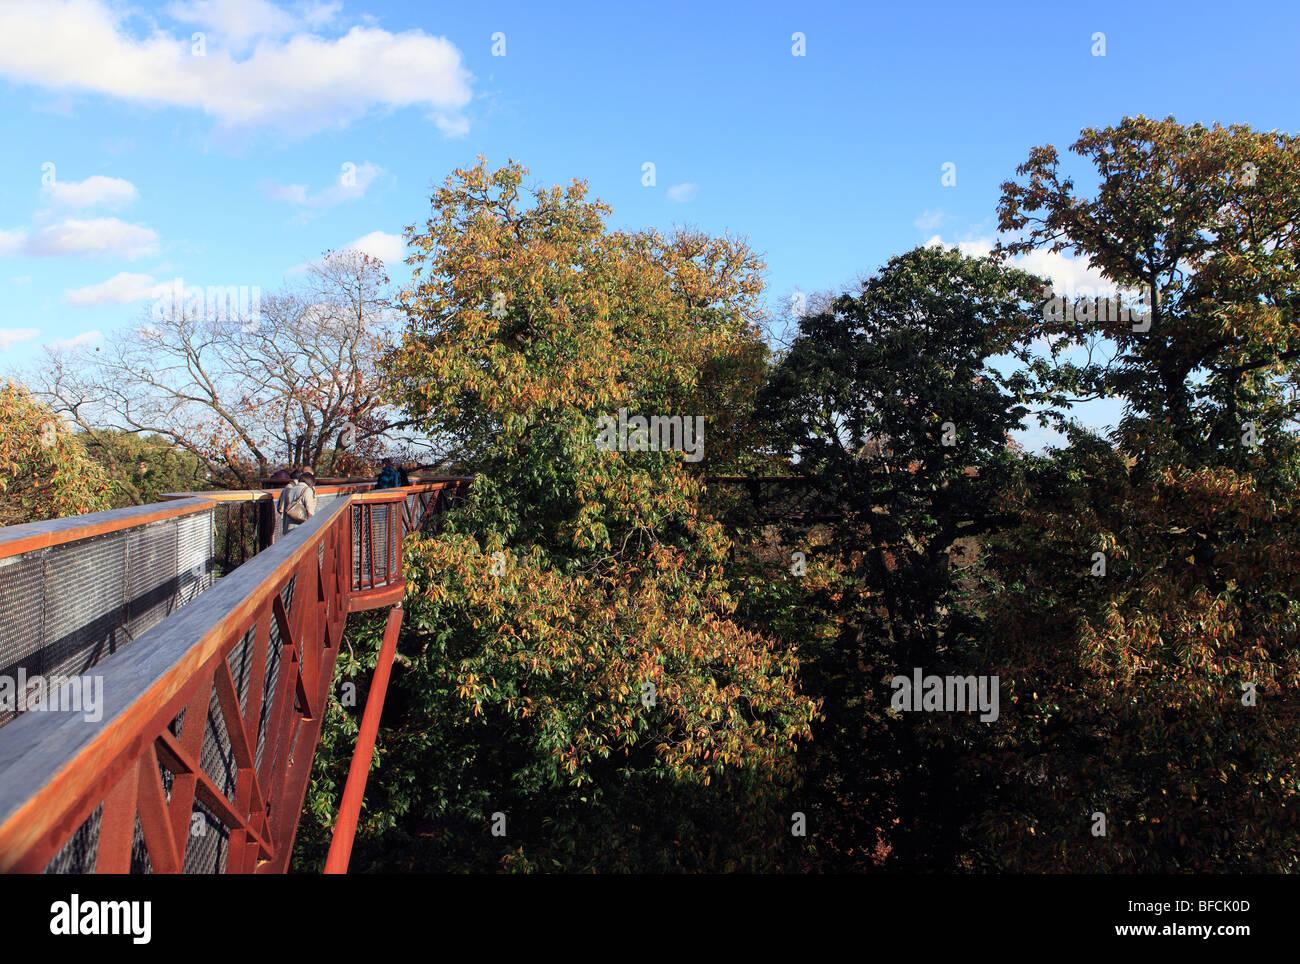 united kingdom west london kew gardens the rhizotron and xstrata treetop walkway - Stock Image